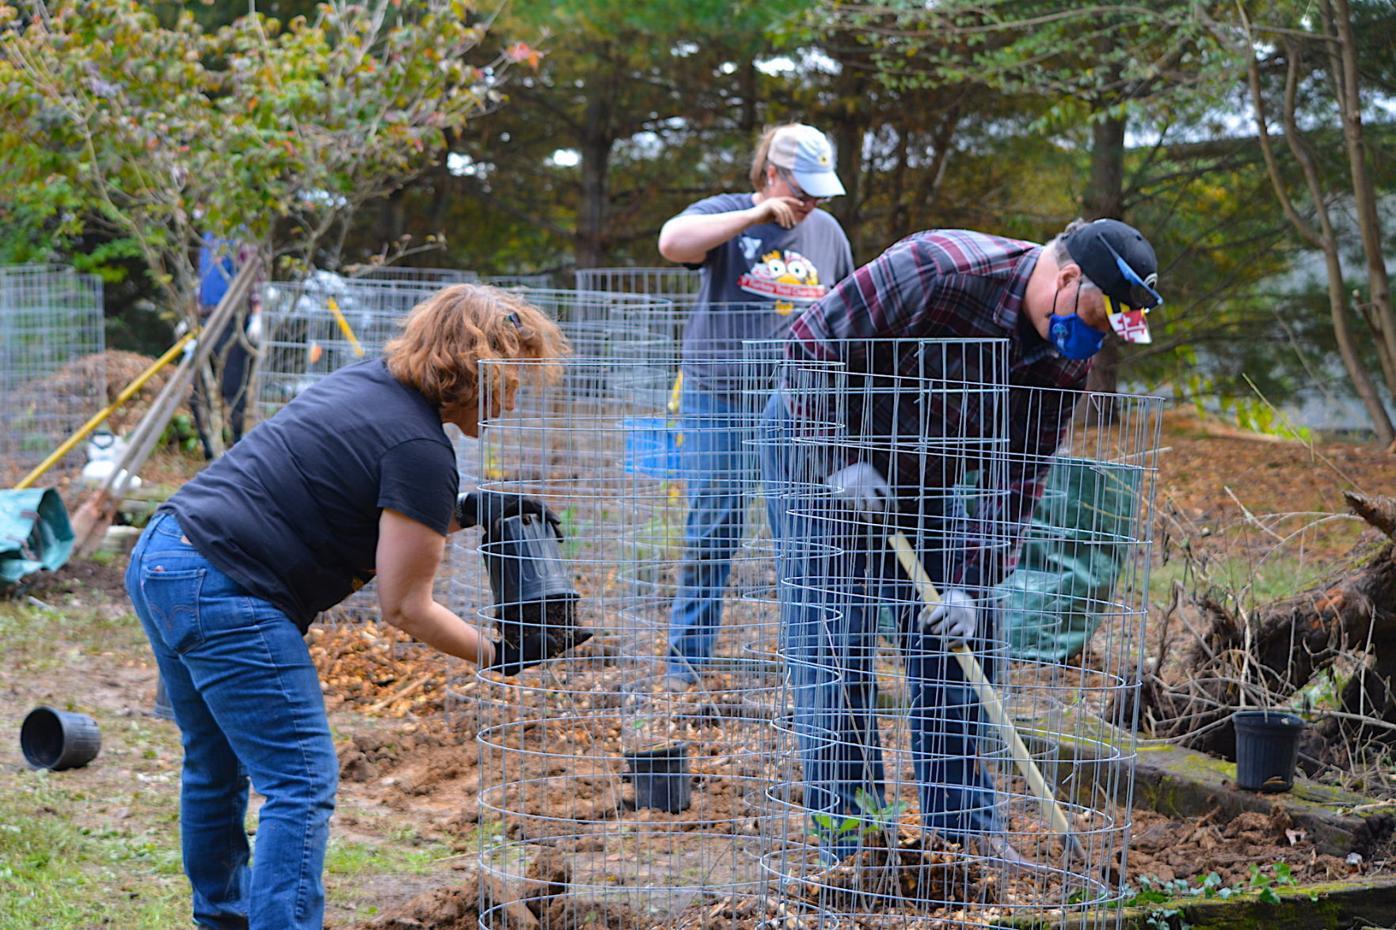 Shrewsbury community garden continues to grow